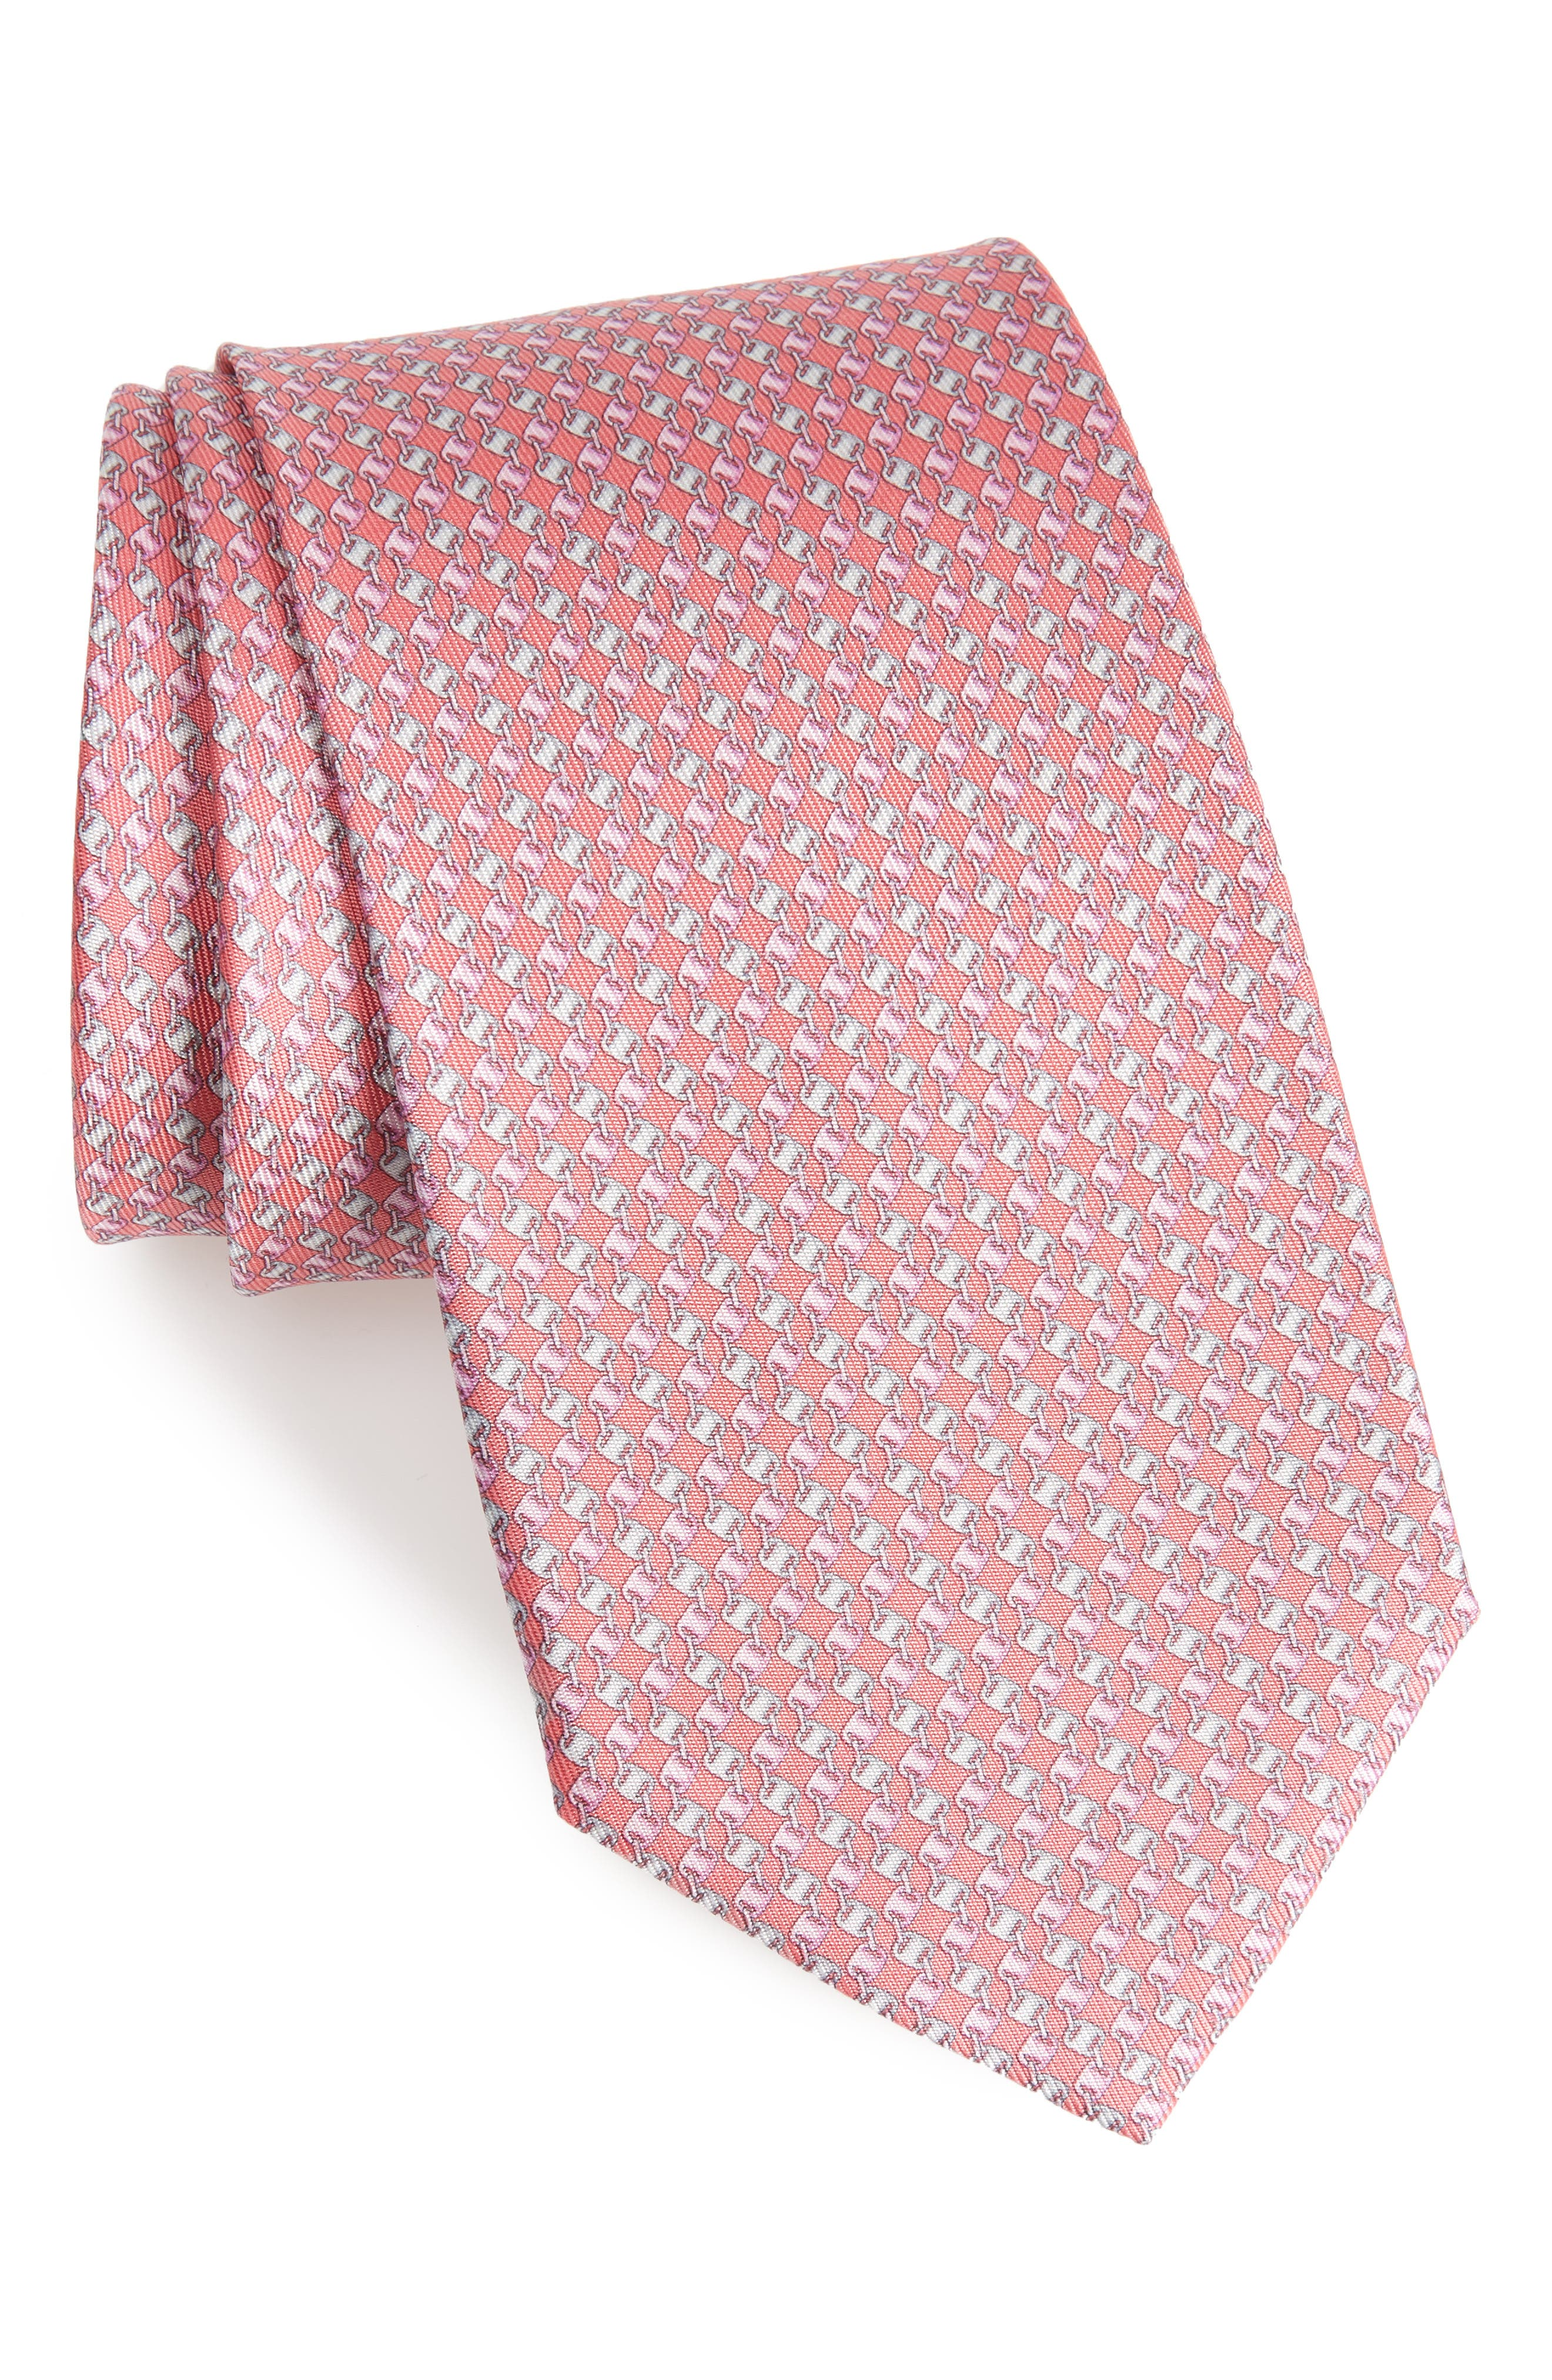 Salvatore Ferragamo Oara Print Silk Tie